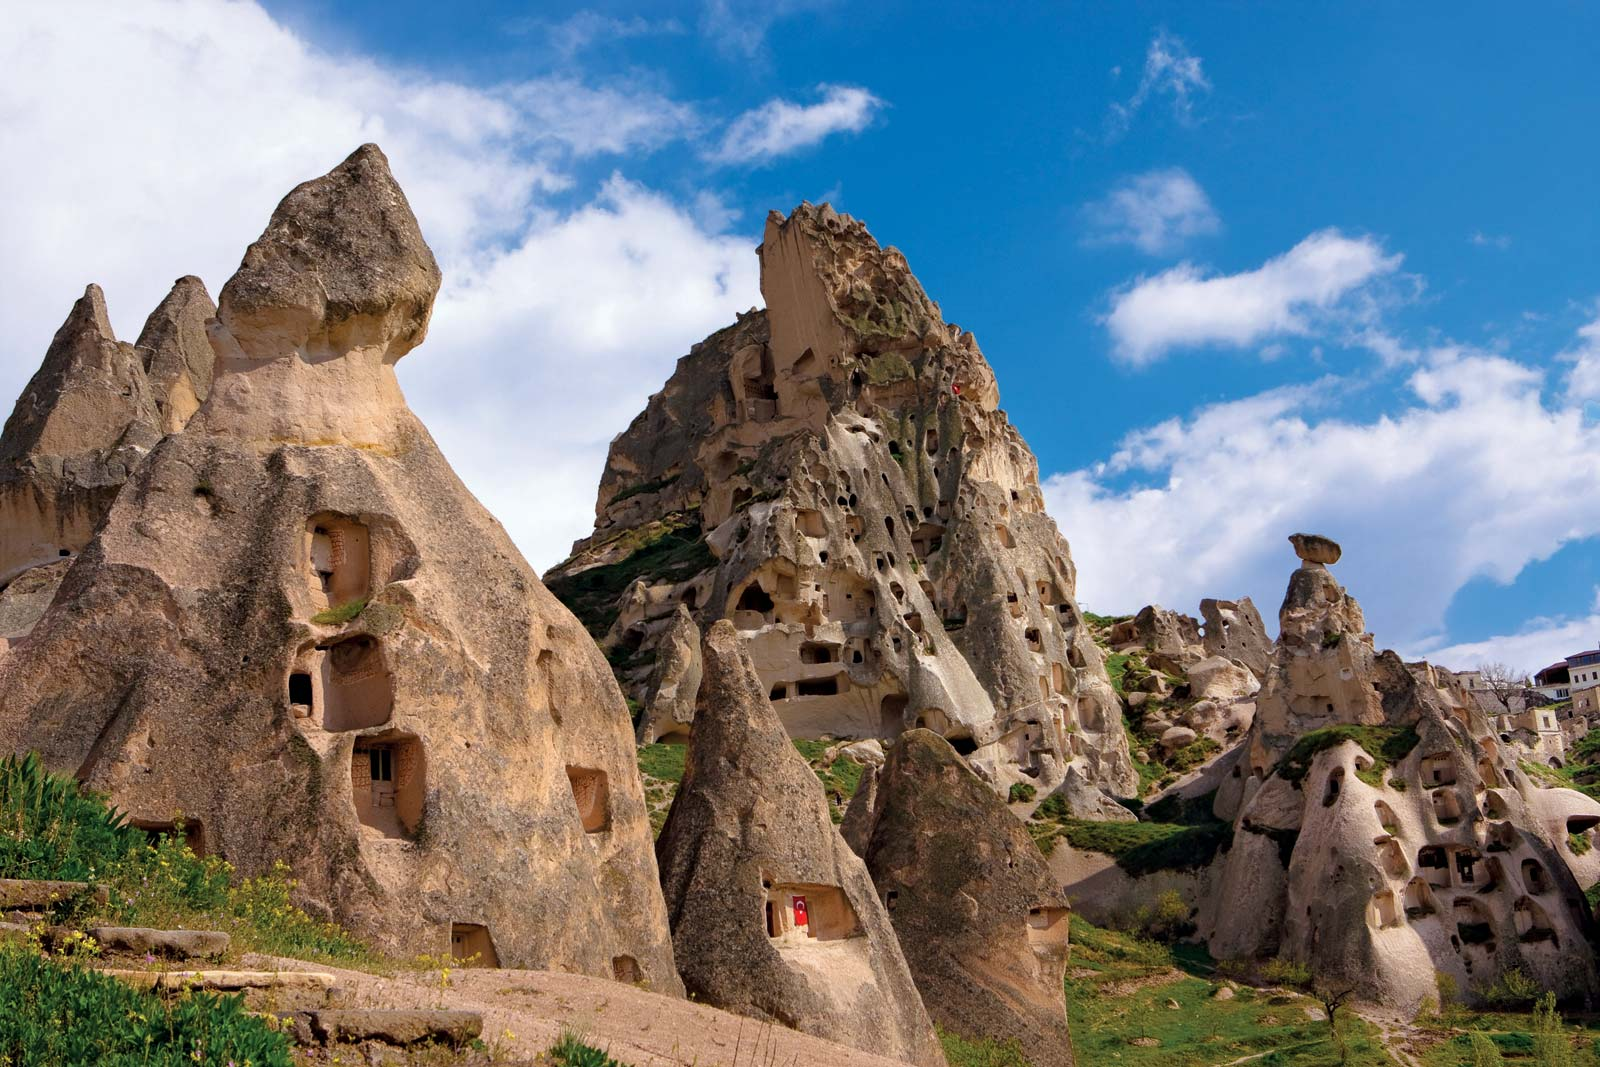 Napuštena pećinska skrovišta u Kapadokiji, Anadolija (Foto: tinzabo/Fotolia)